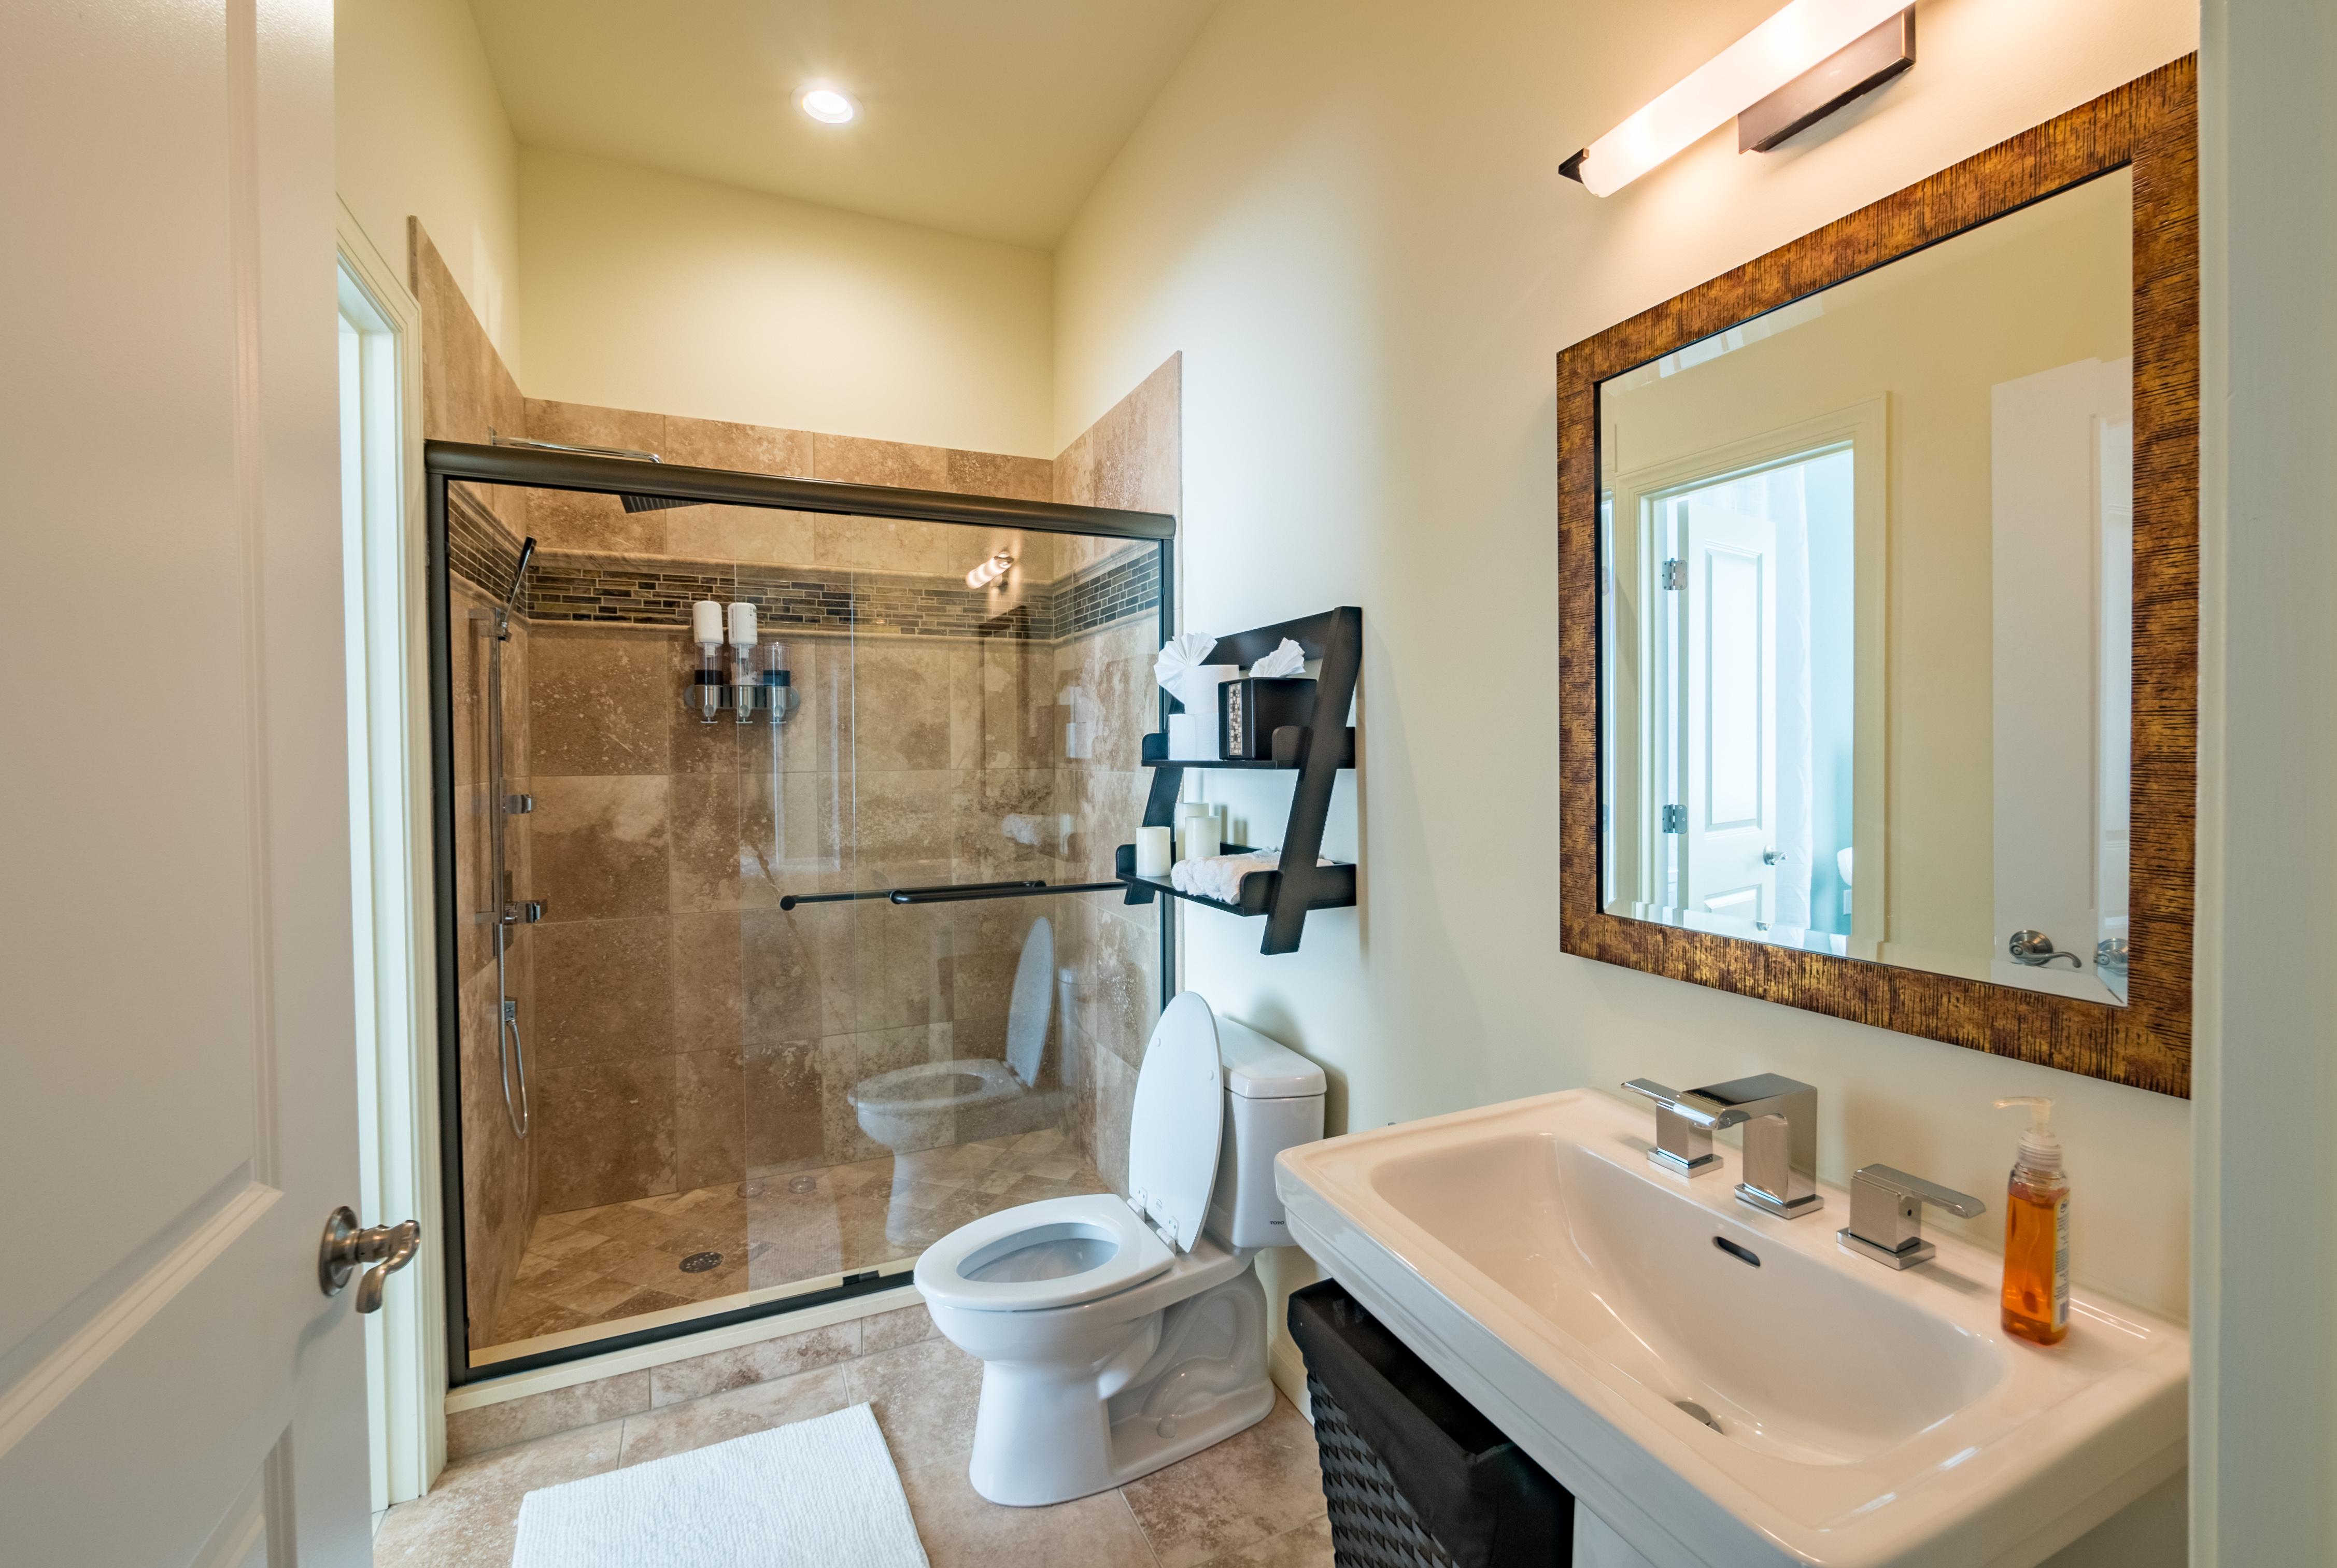 En Suite Bathroom For Scrubs And Wraps